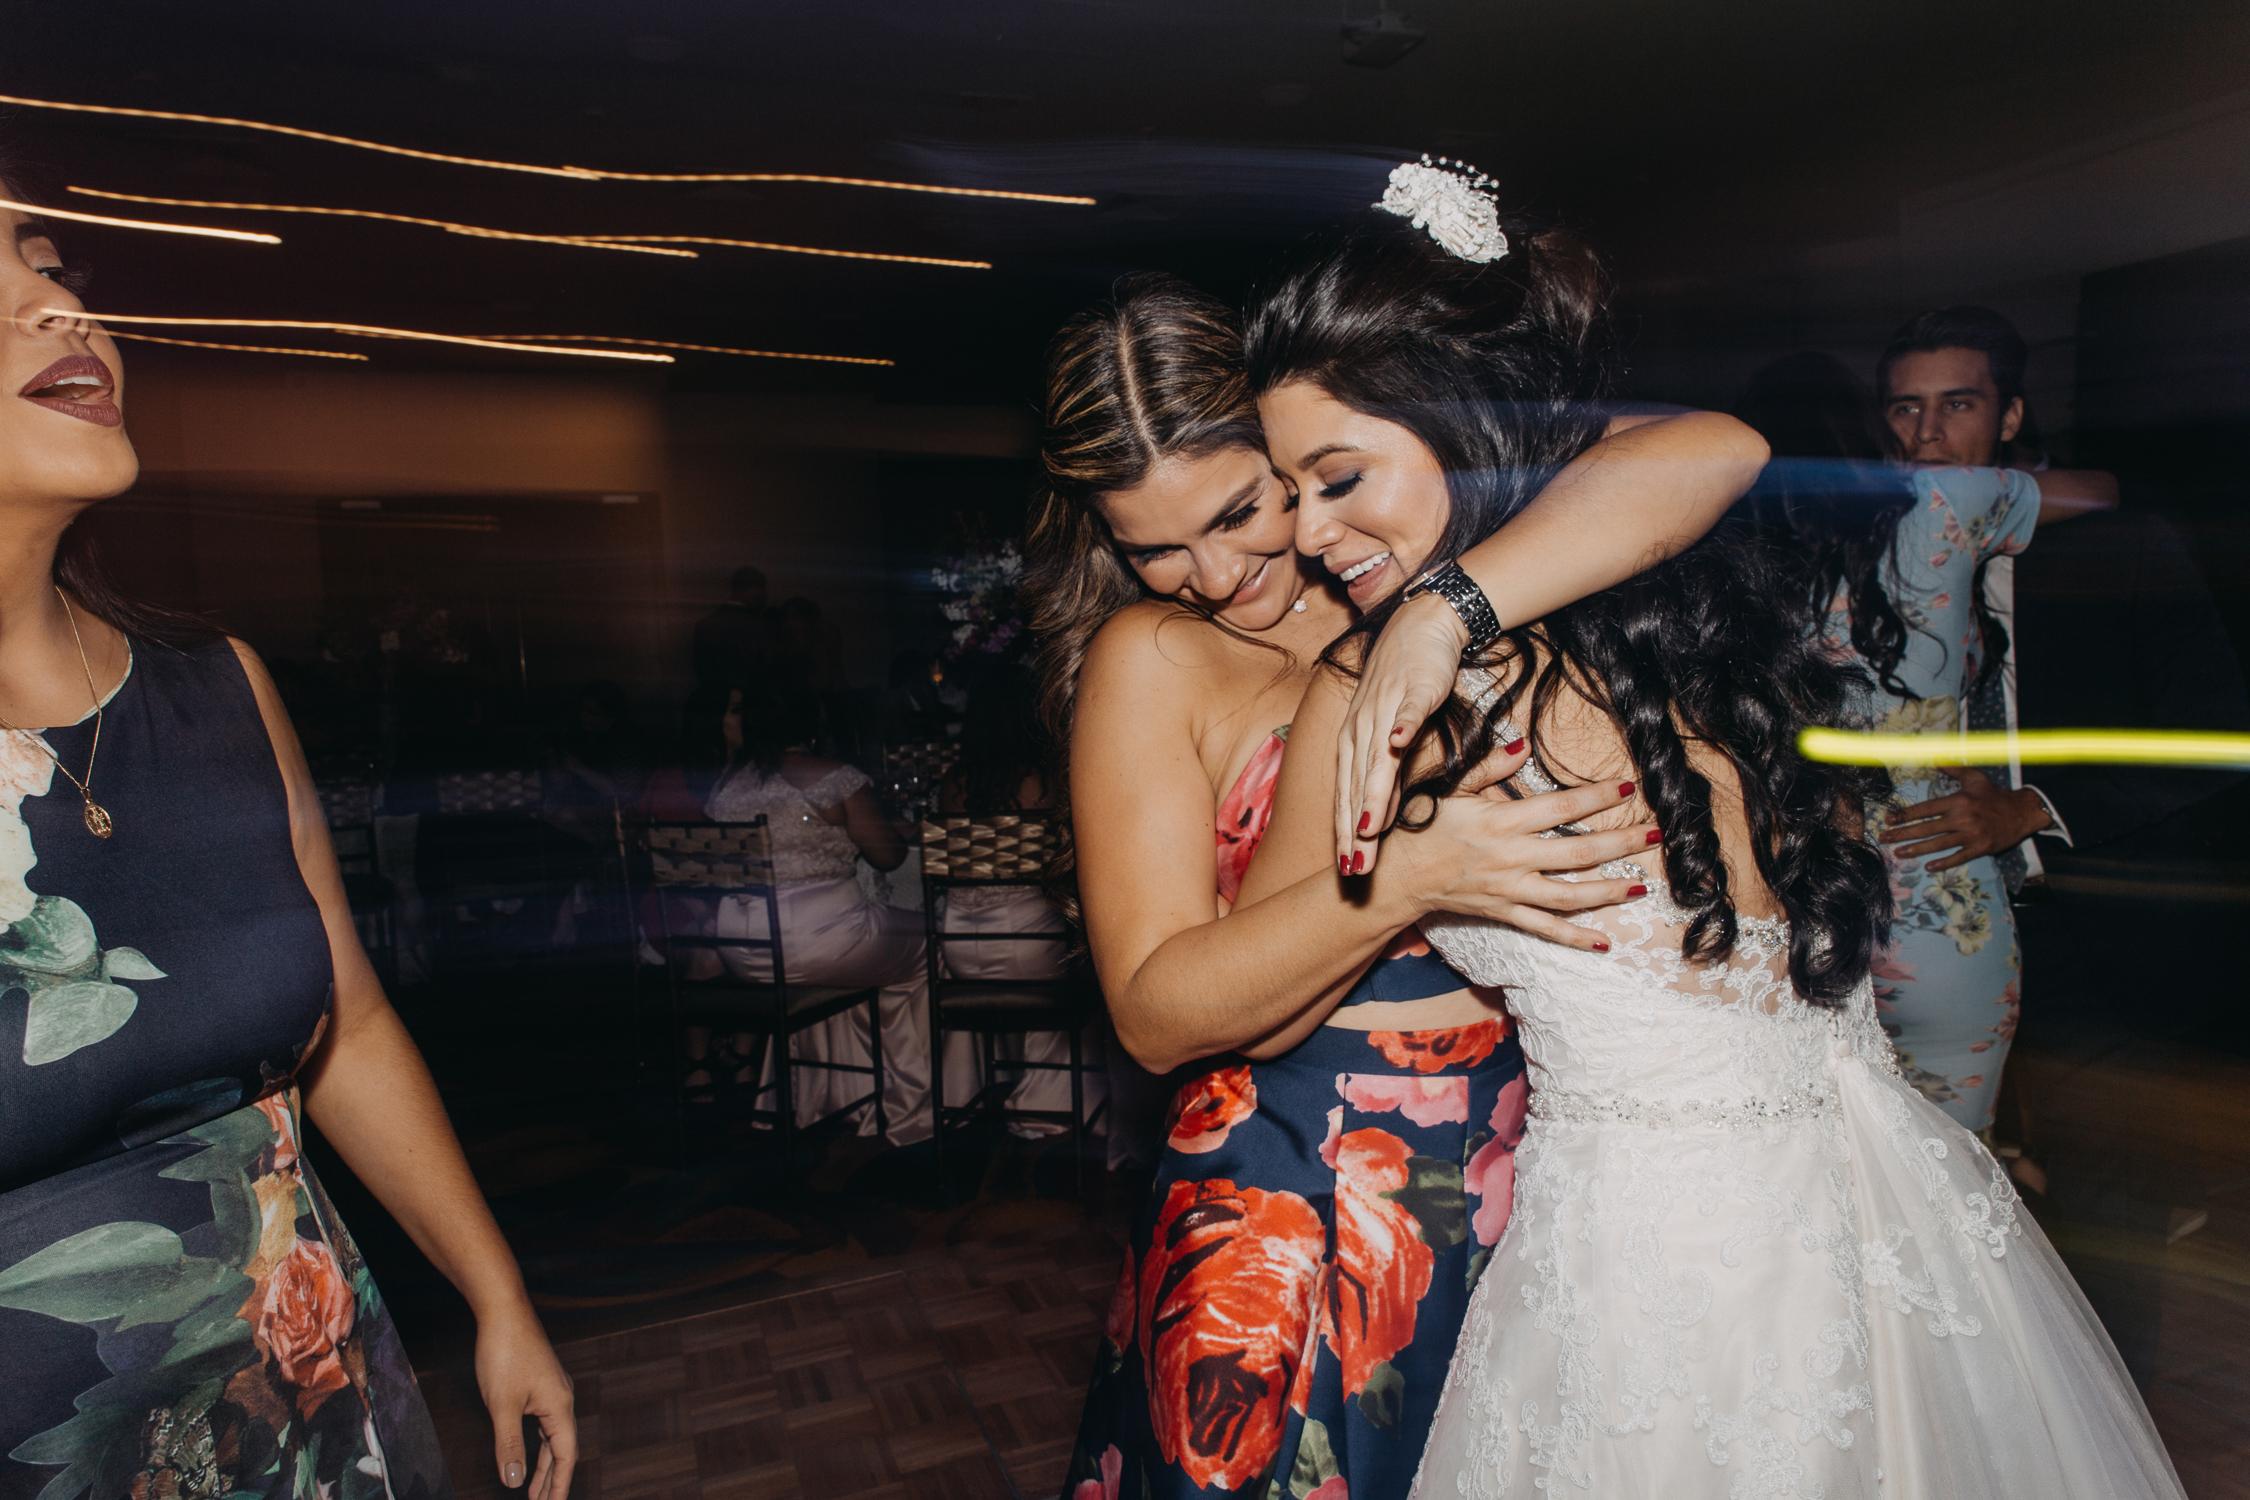 Michelle-Agurto-Fotografia-Bodas-Ecuador-Destination-Wedding-Photographer-Daniela-Dirk-71.JPG